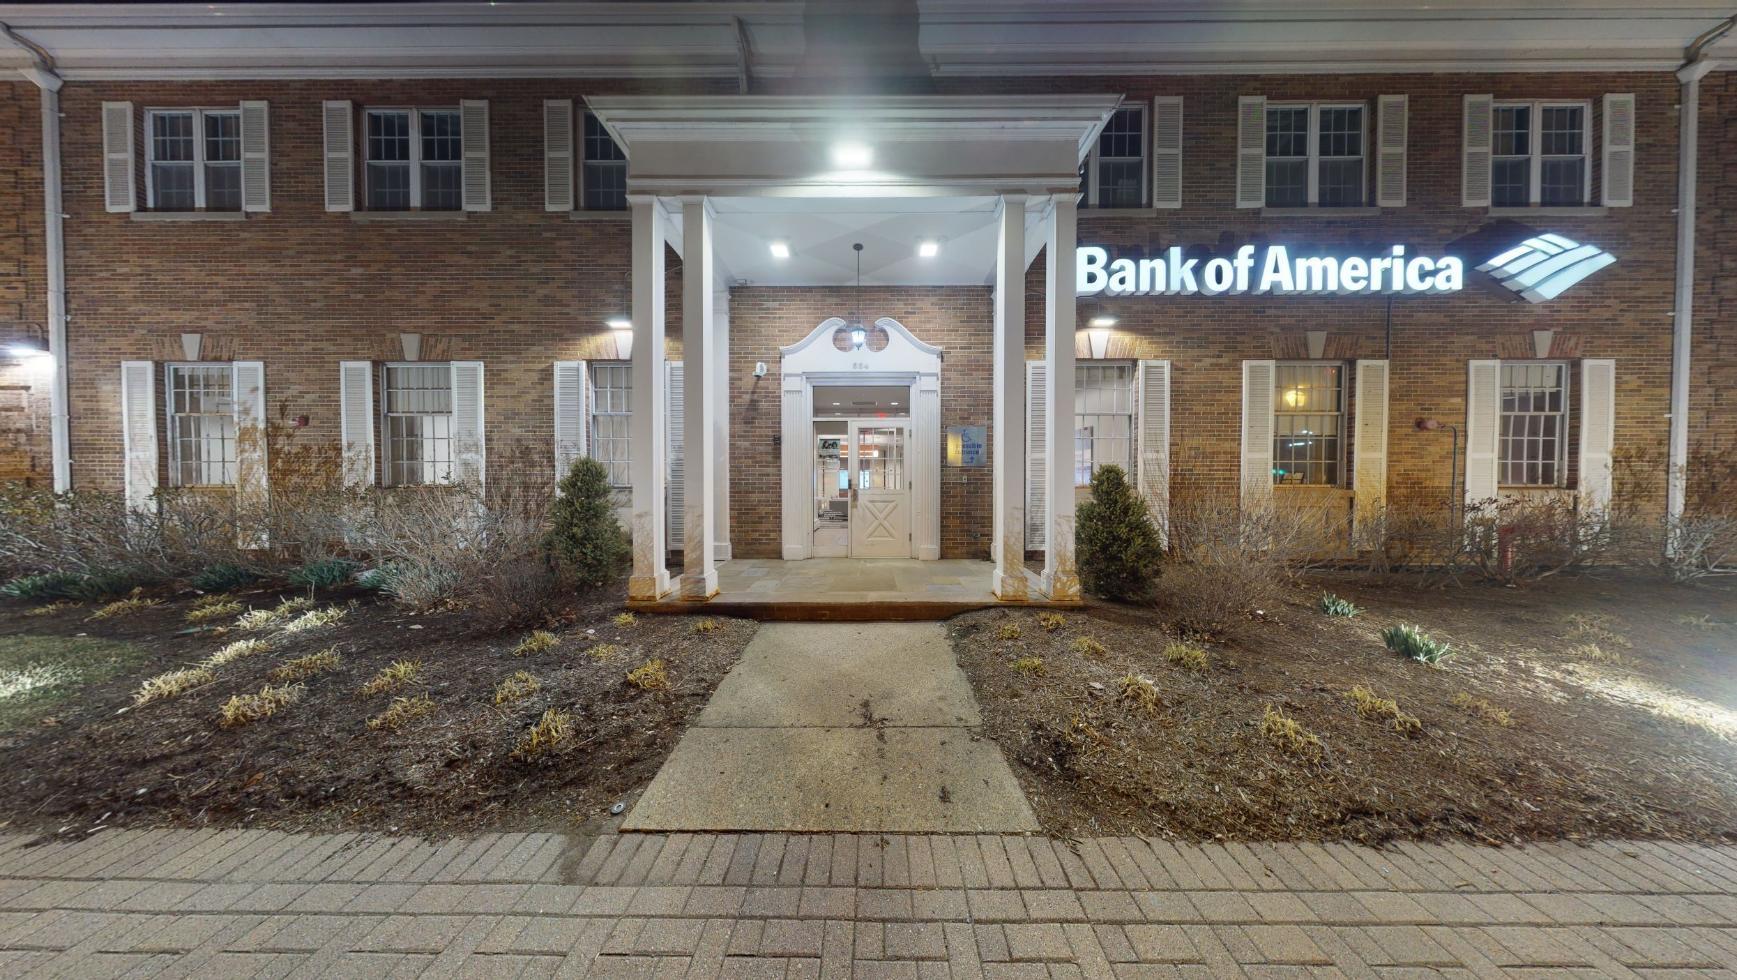 Bank of America financial center with drive-thru ATM   554 S Livingston Ave, Livingston, NJ 07039